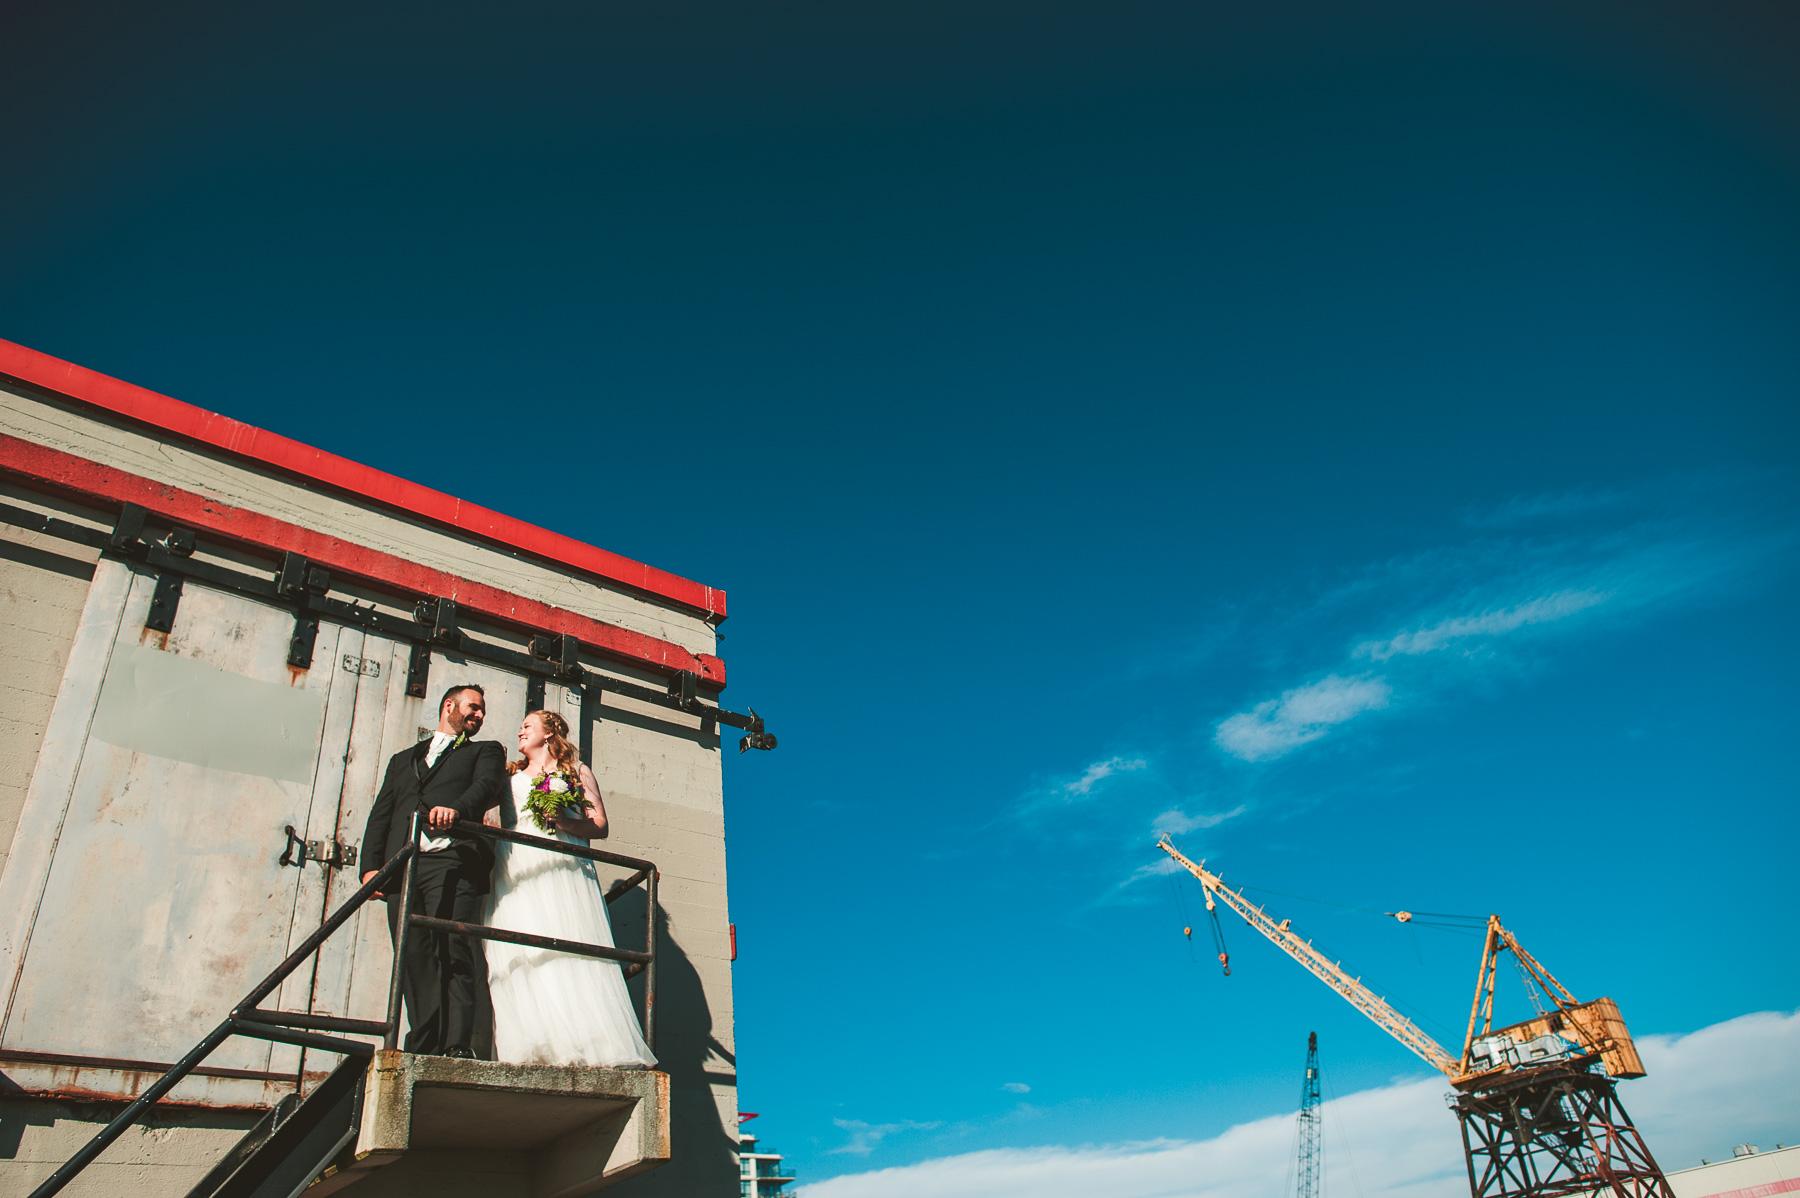 Victoria-BC-Wedding-Photography-127.jpg